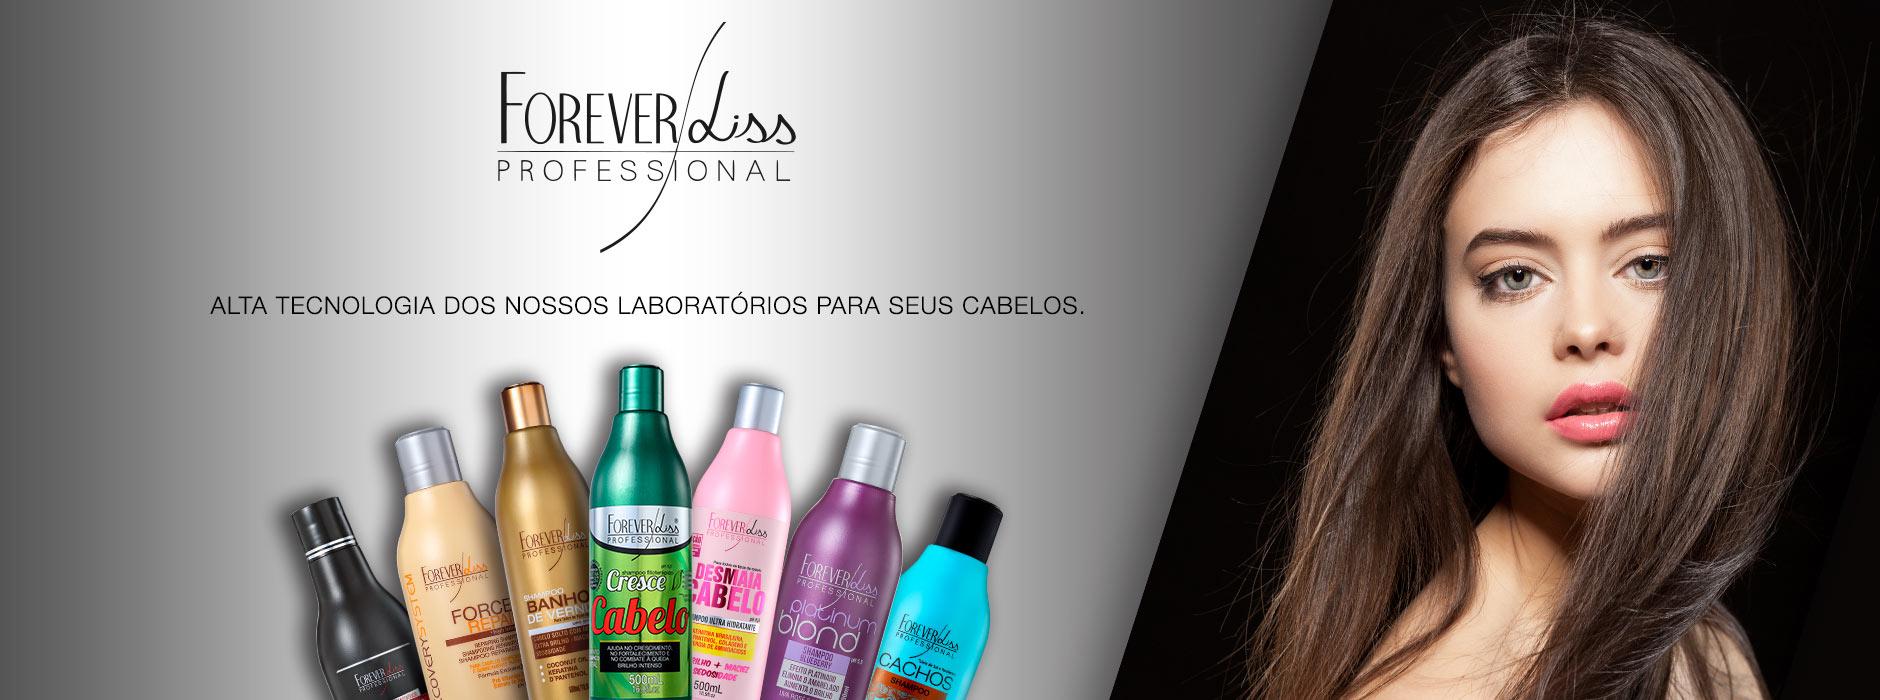 Forever liss professional/Cabelos/Escova progressiva